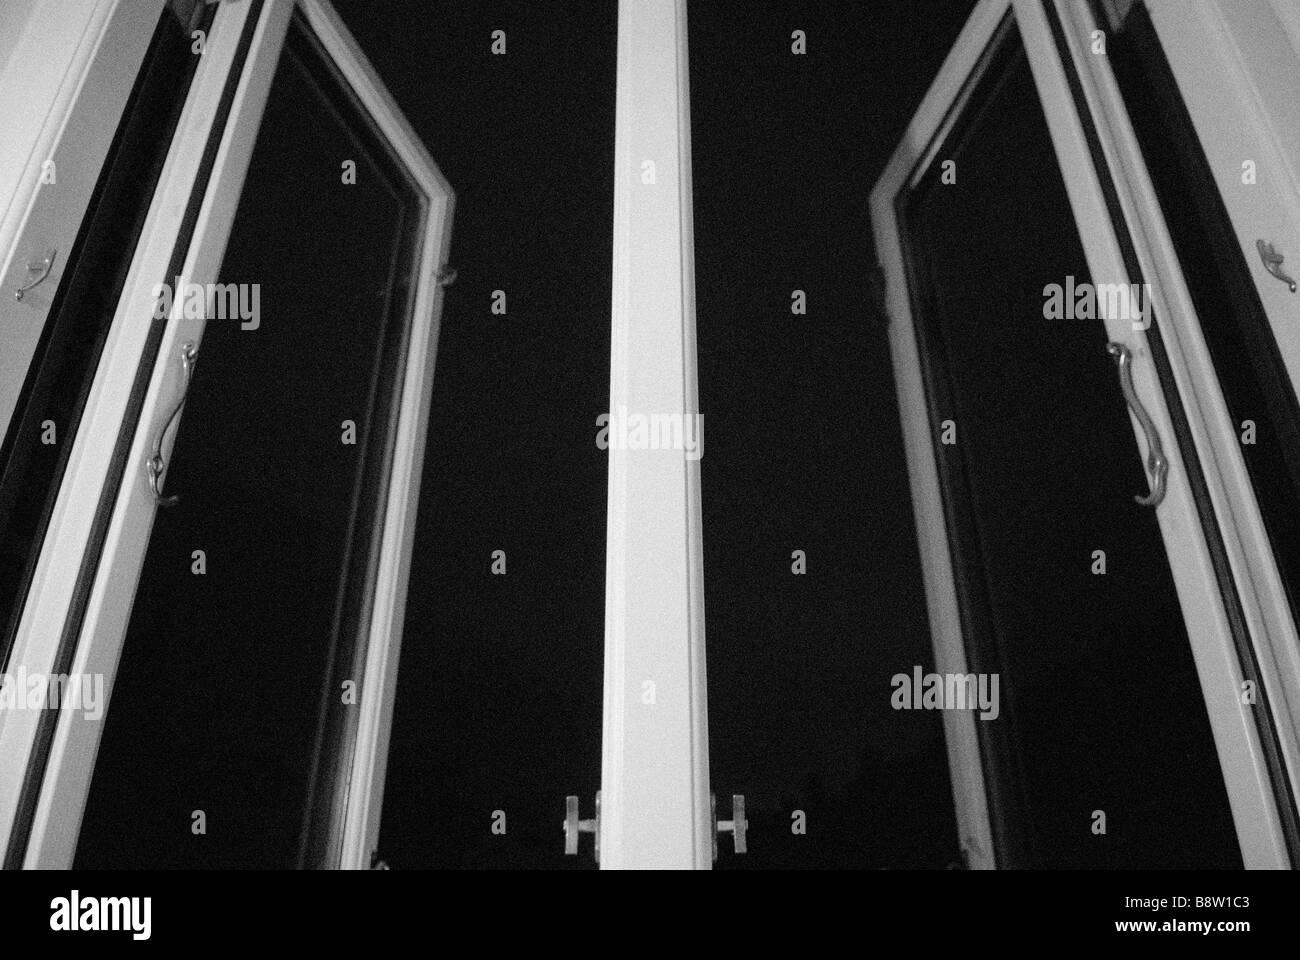 OPENED WINDOWS - Stock Image